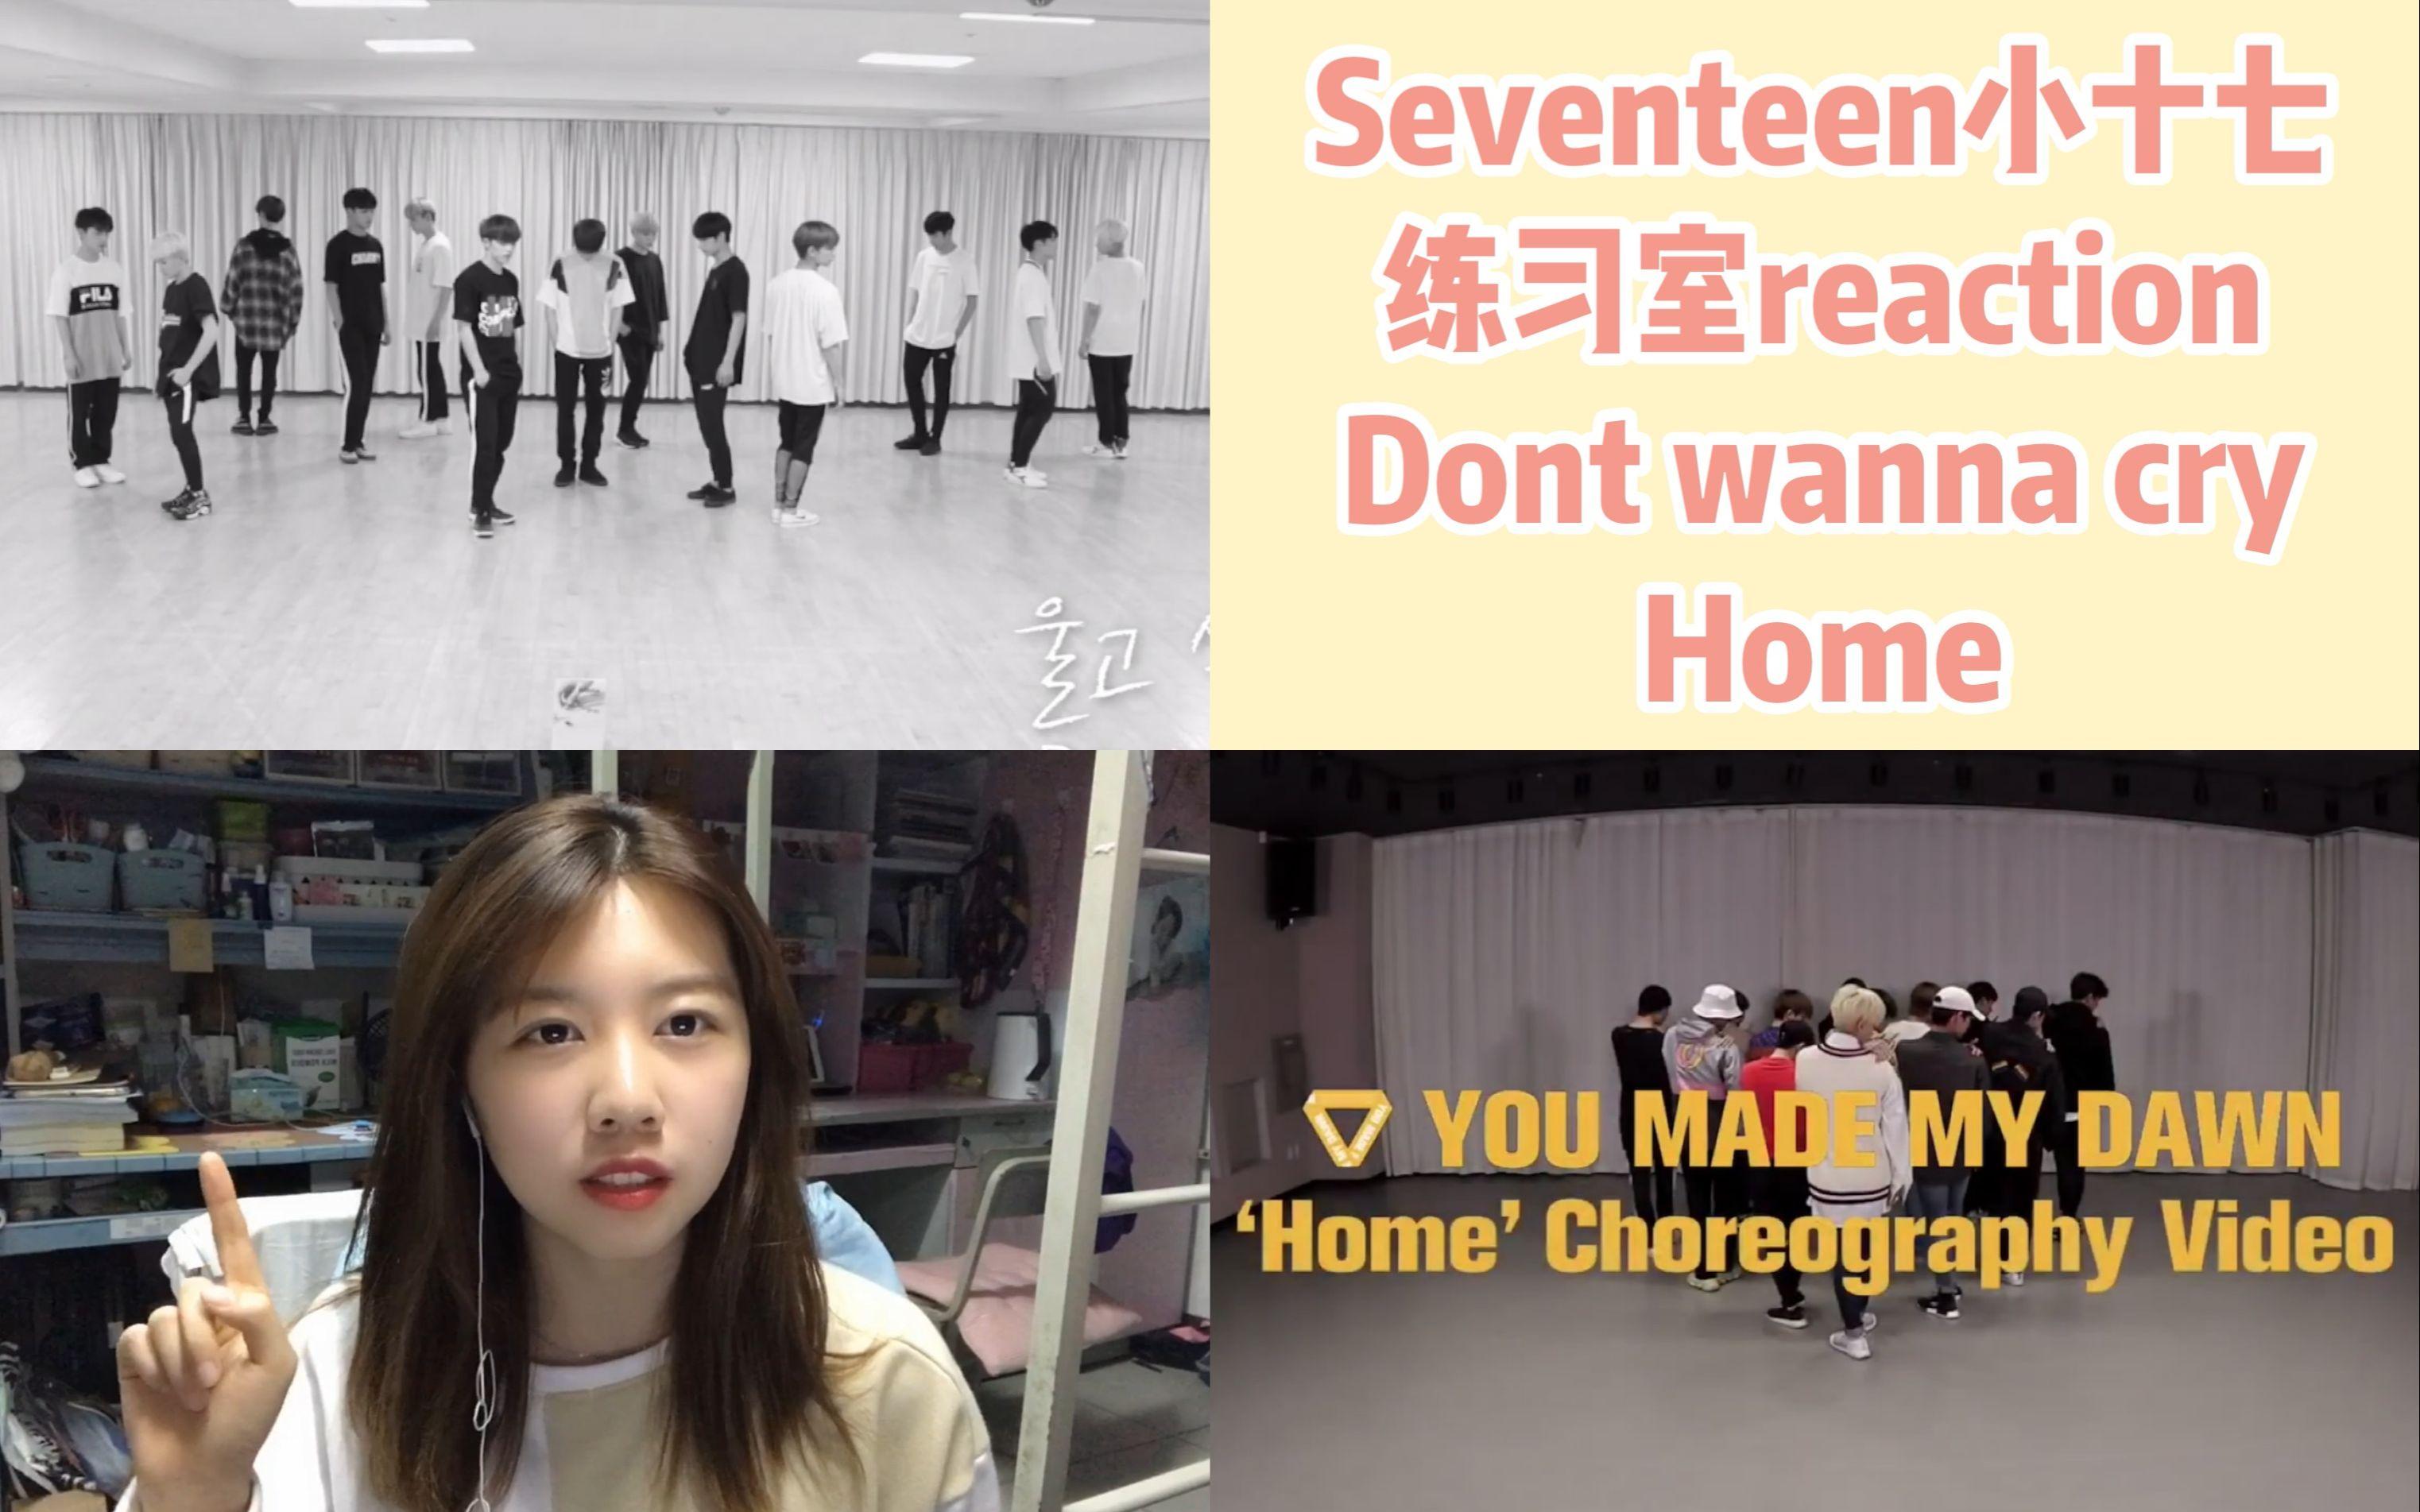 【Seventeen小十七练习室reaction】《Don't wanna cry》《Home》真的太整齐了!好喜欢他们的编舞!_哔哩哔哩  (゜-゜)つロ 干杯~-bilibili